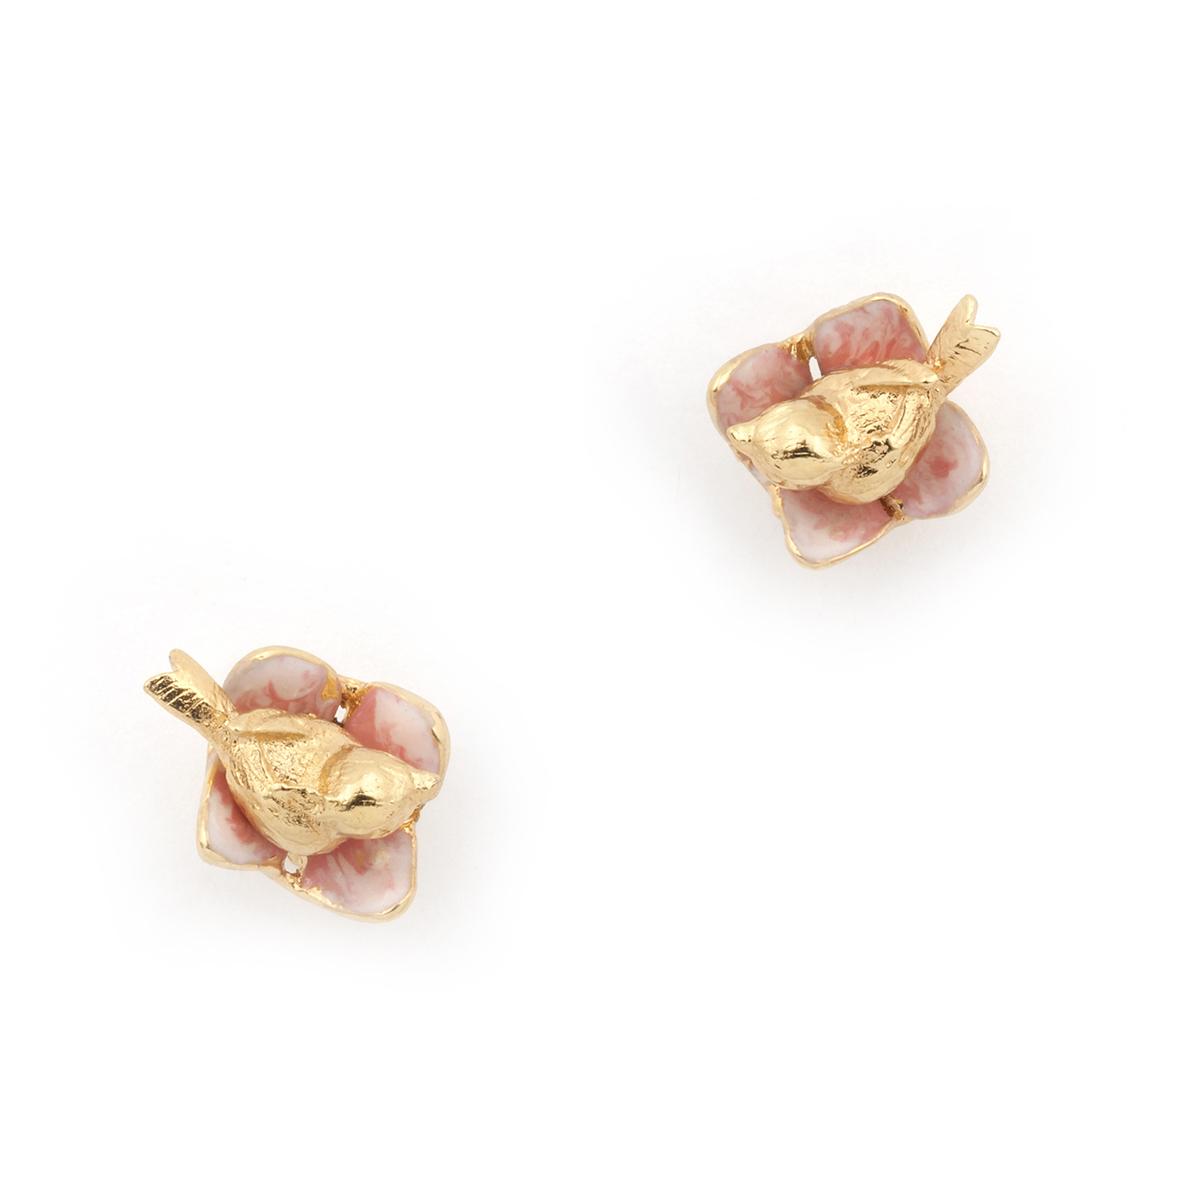 Bird nest gold stud earrings